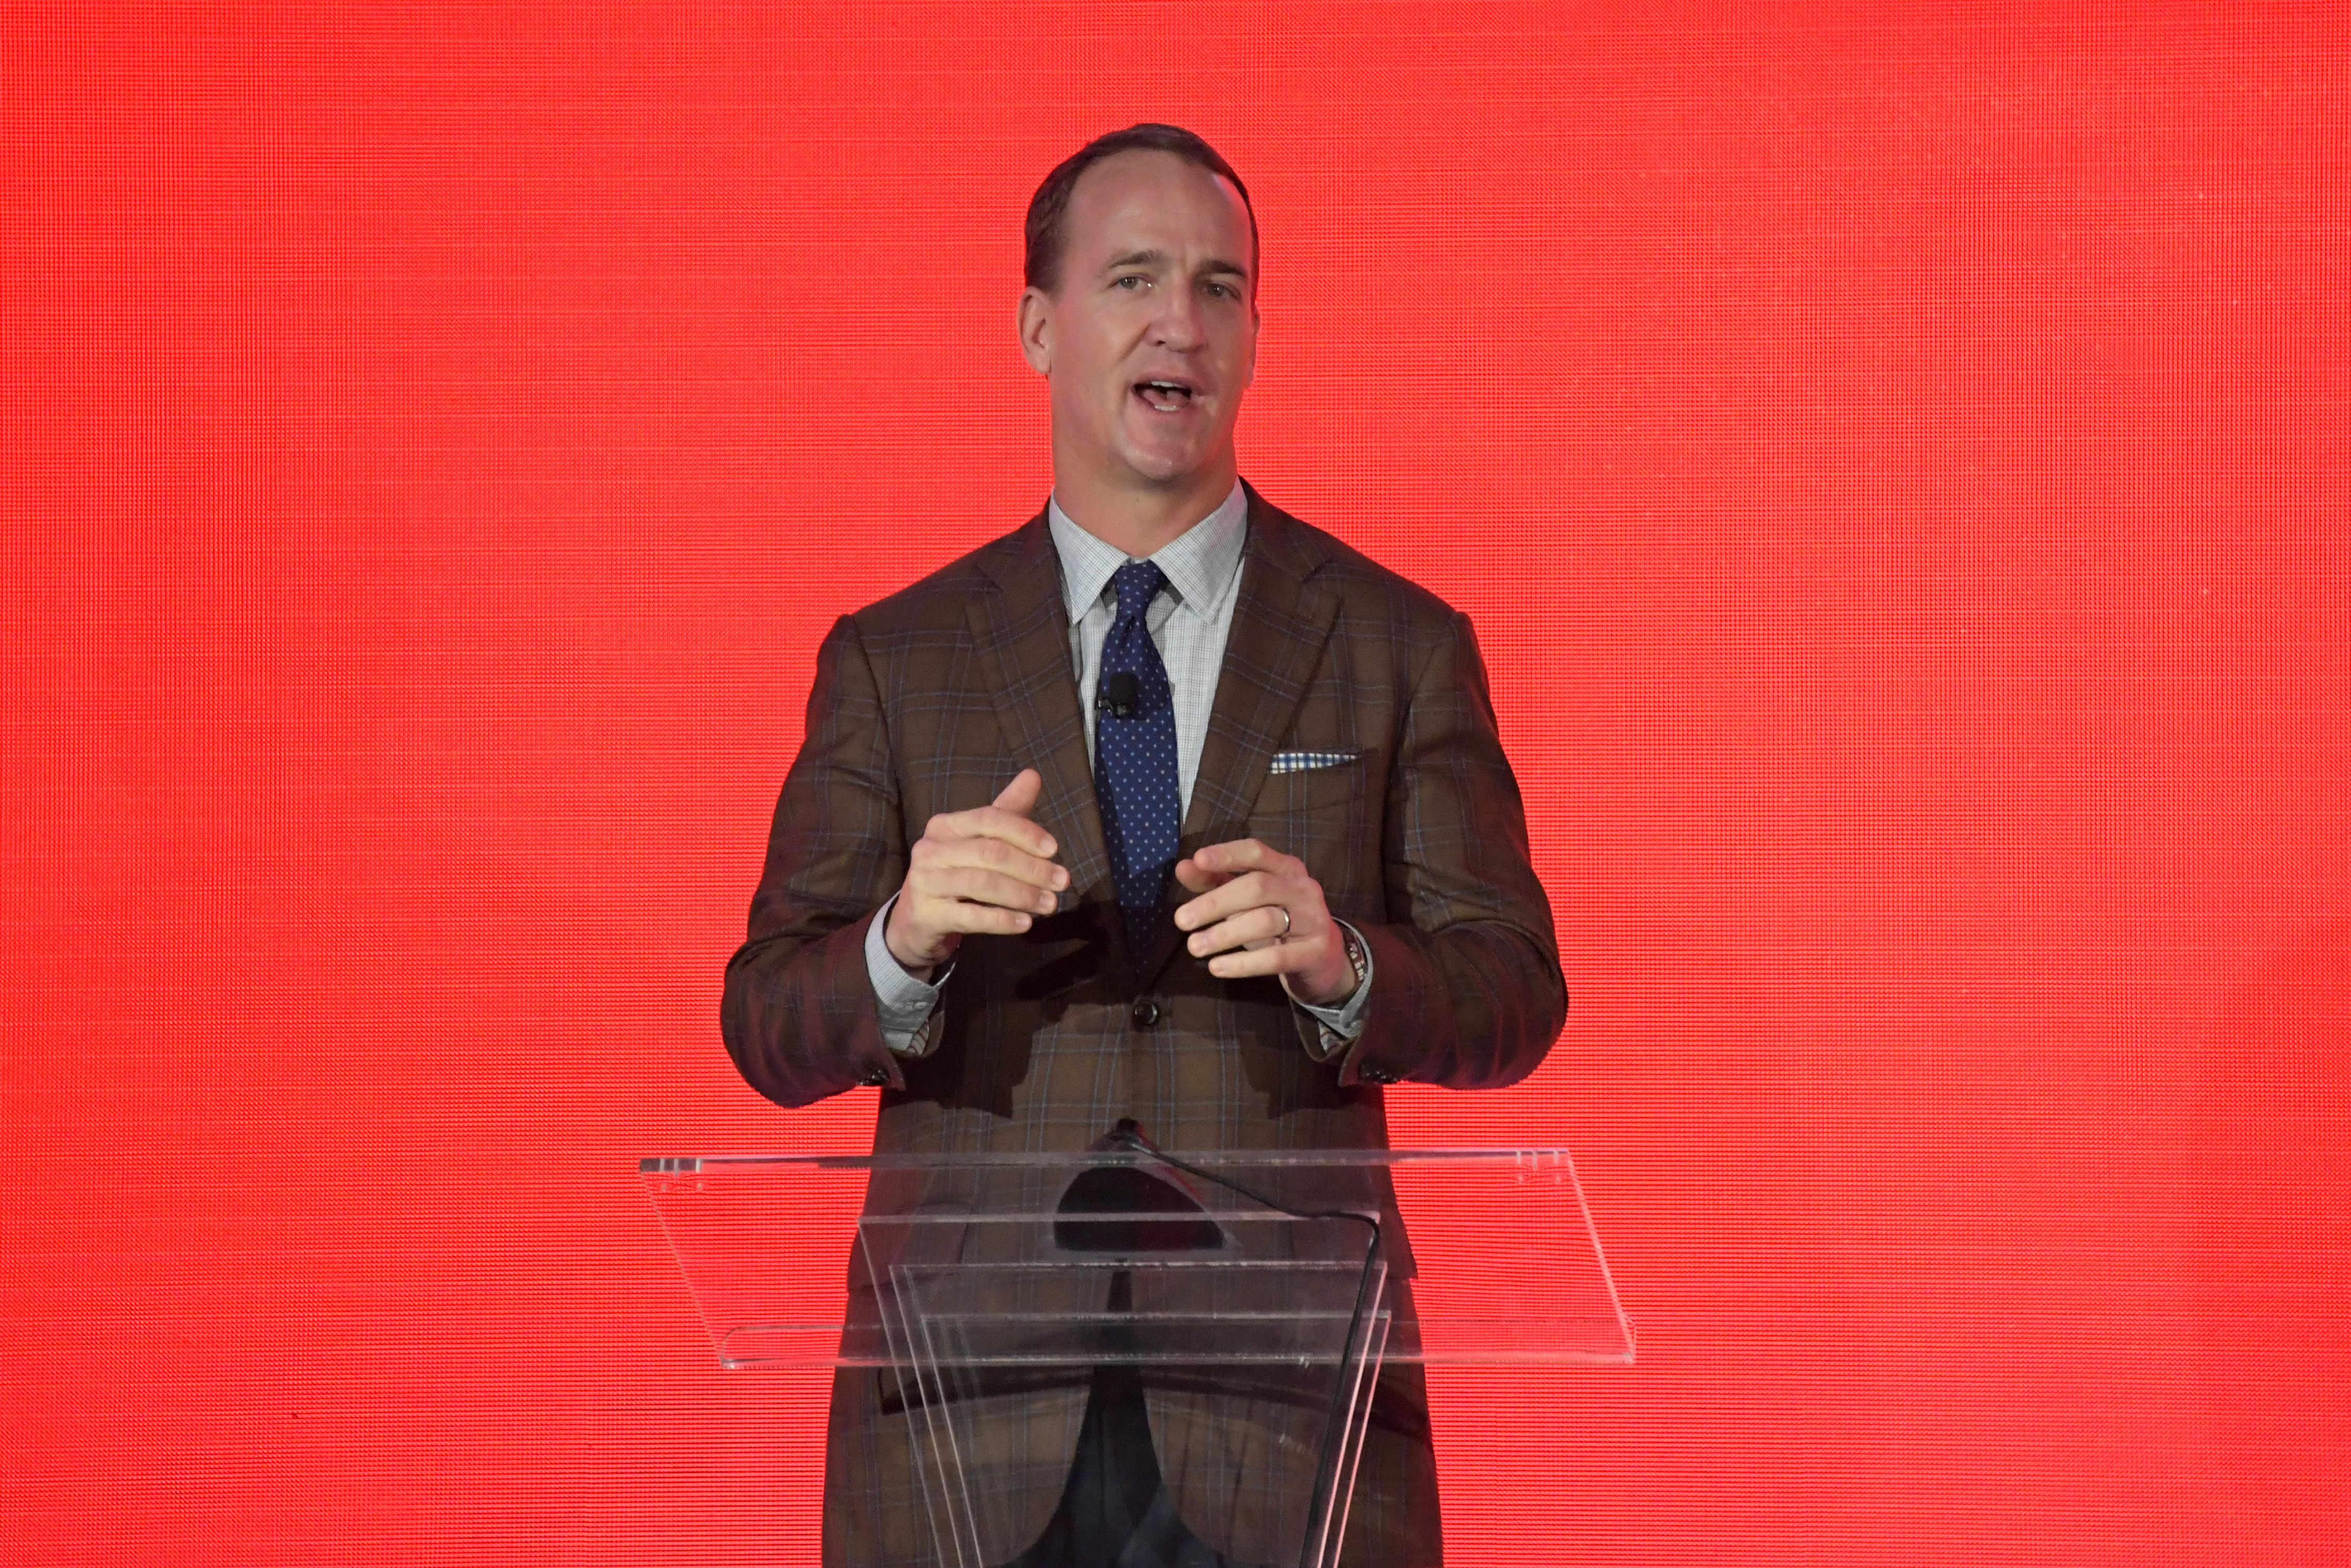 Peyton Manning heaps praise on Patrick Mahomes